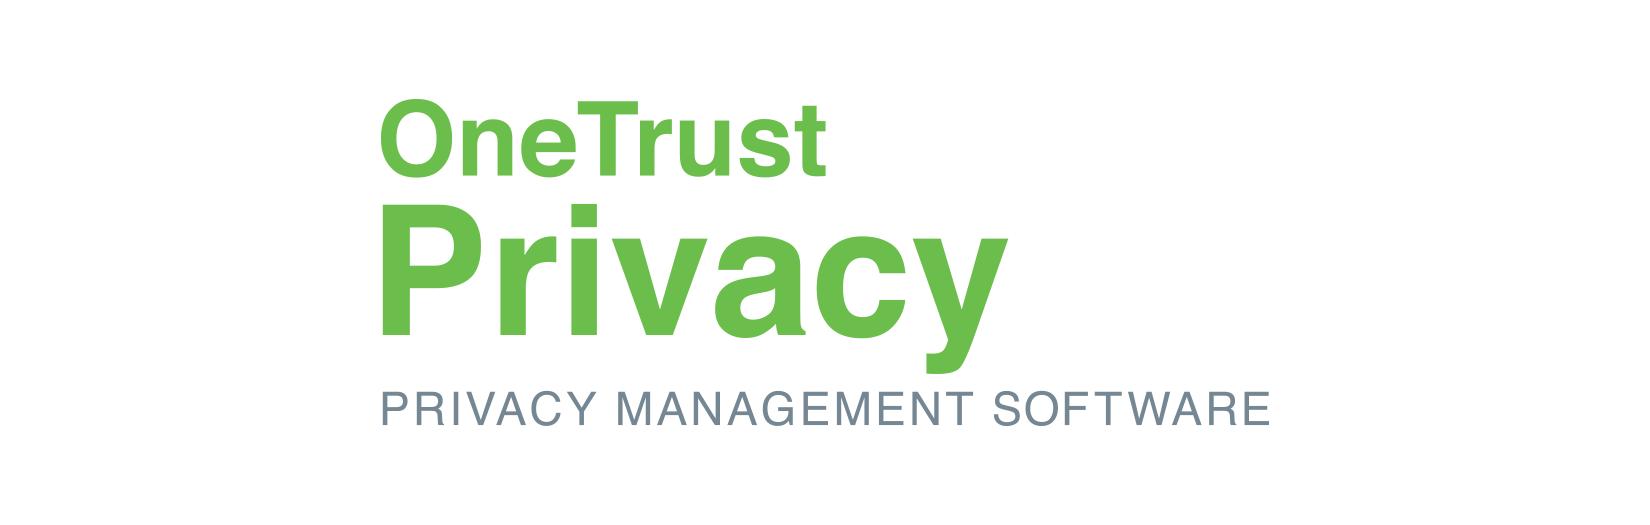 OneTrust Privacy Management Platform logo